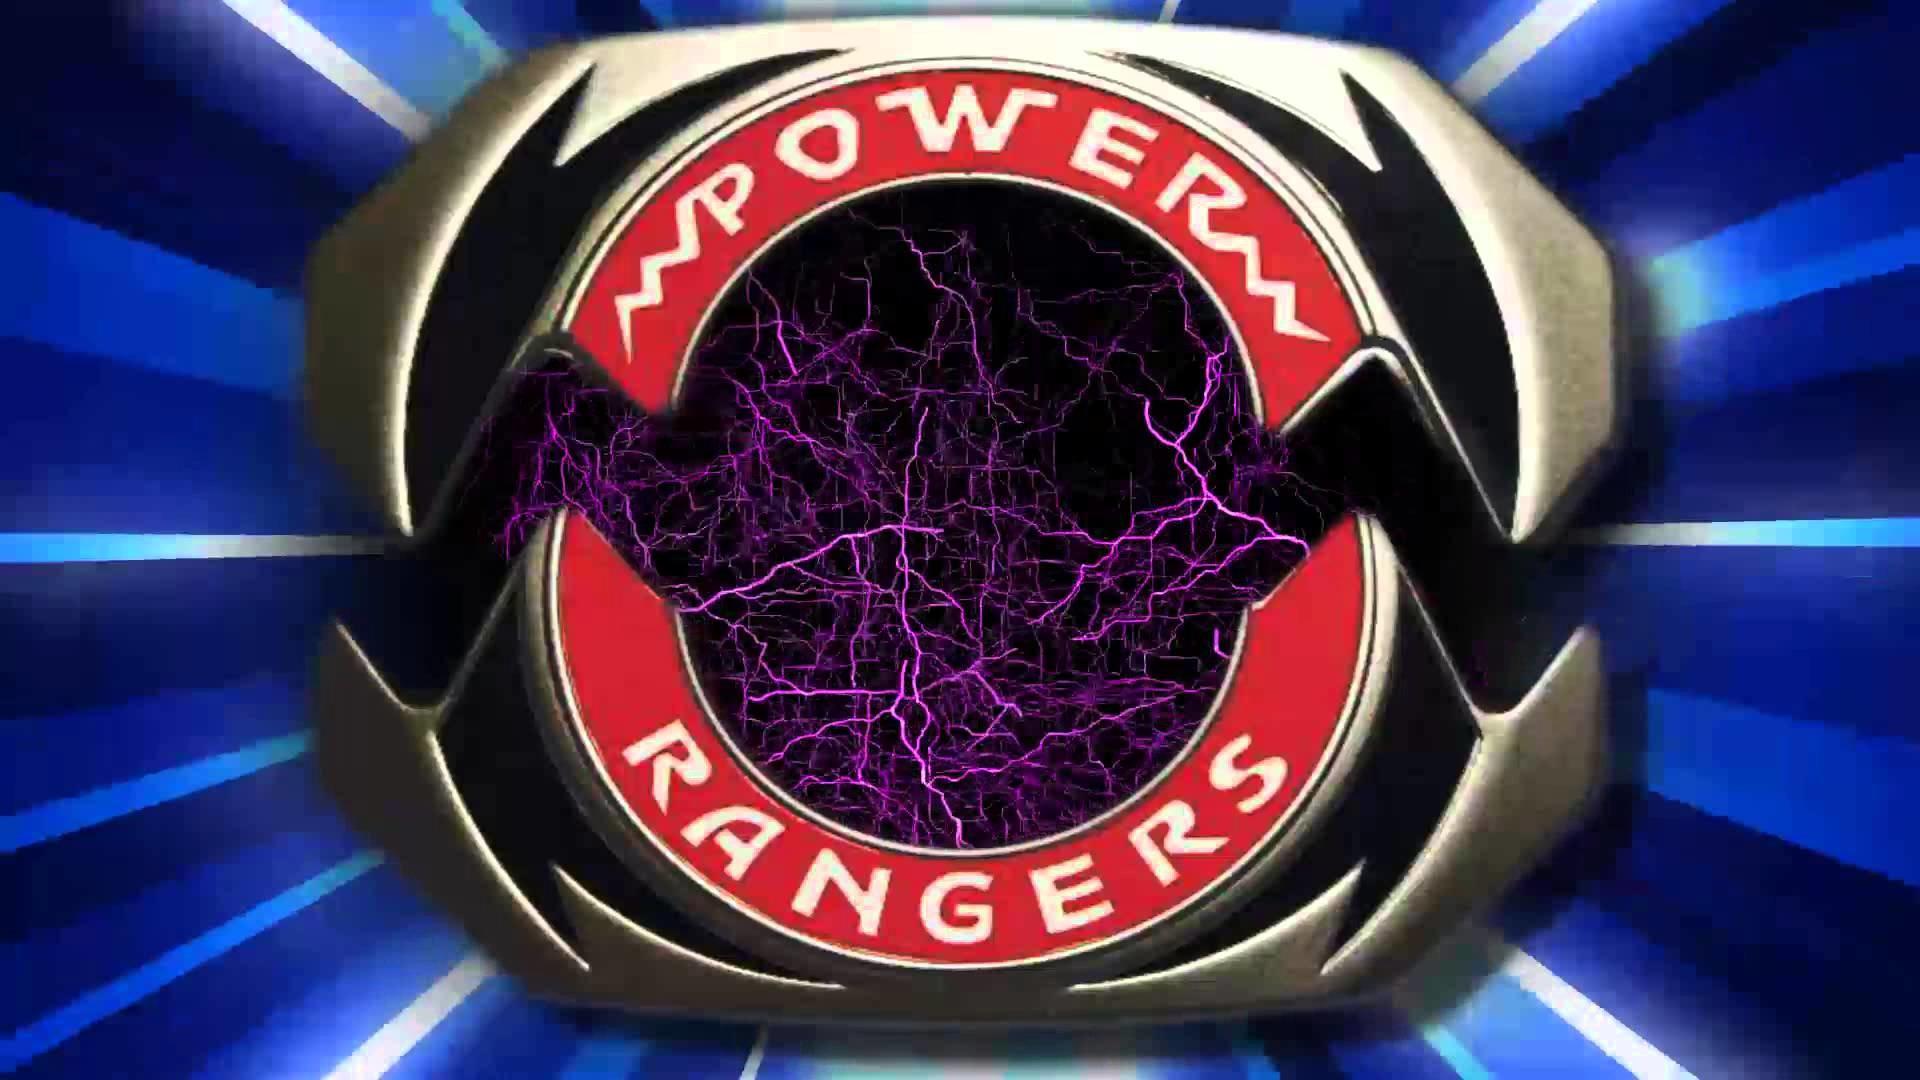 Power Rangers Morphing Background – YouTube